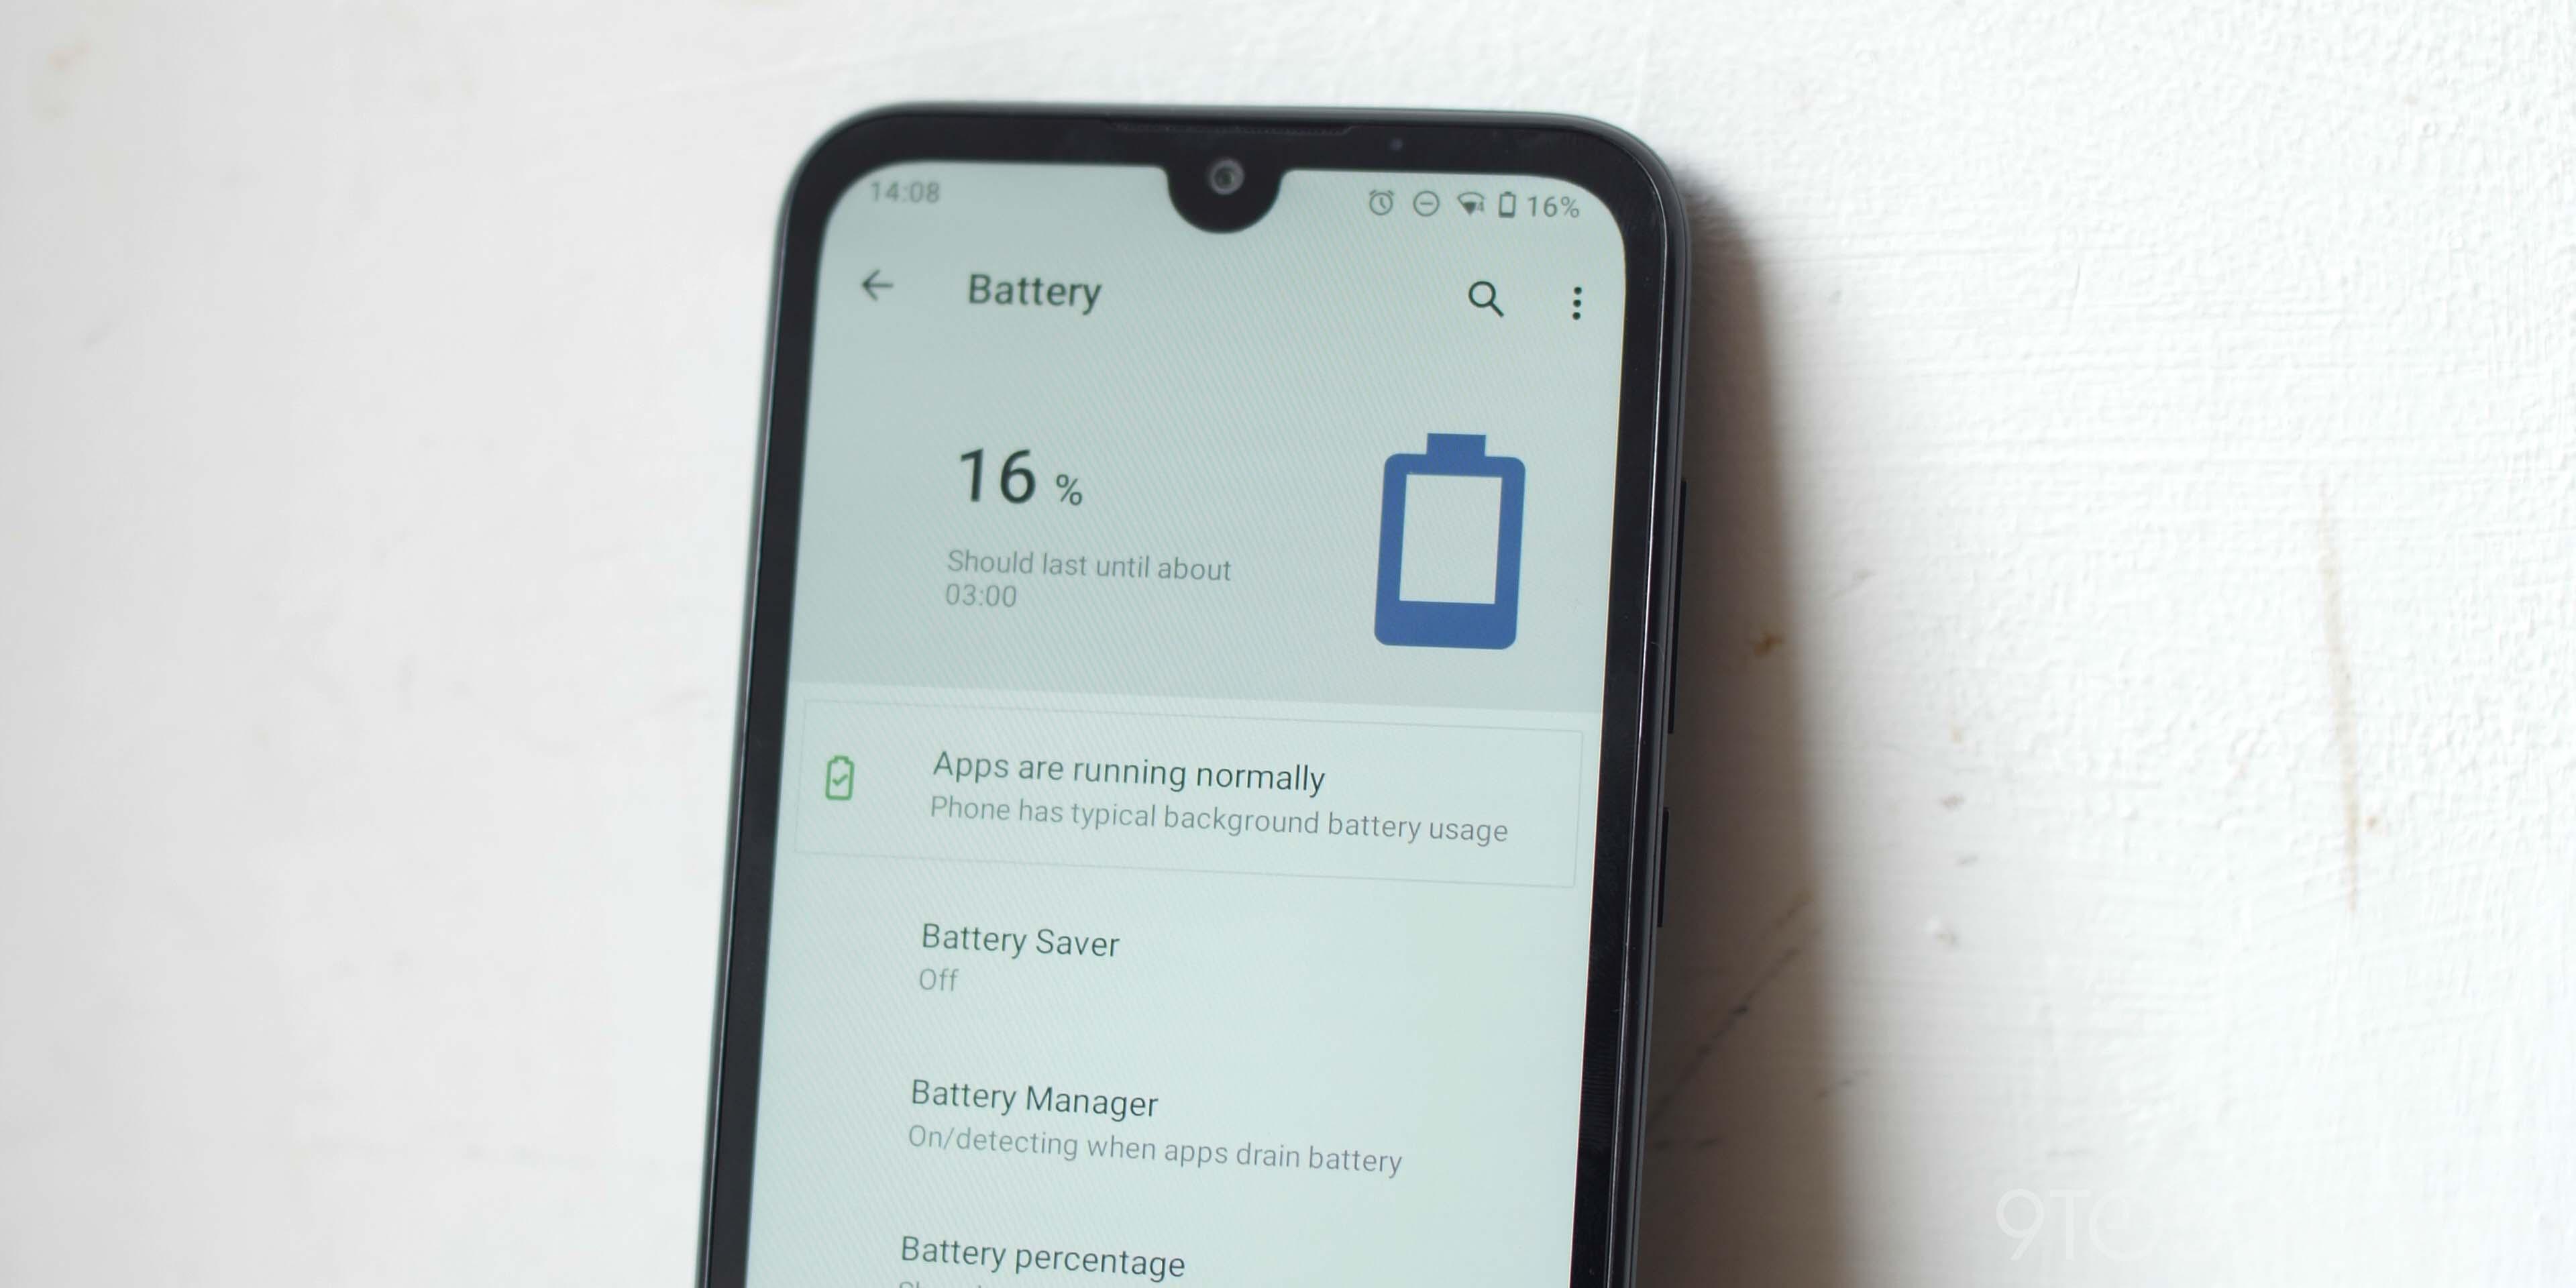 Nokia 1.3 battery